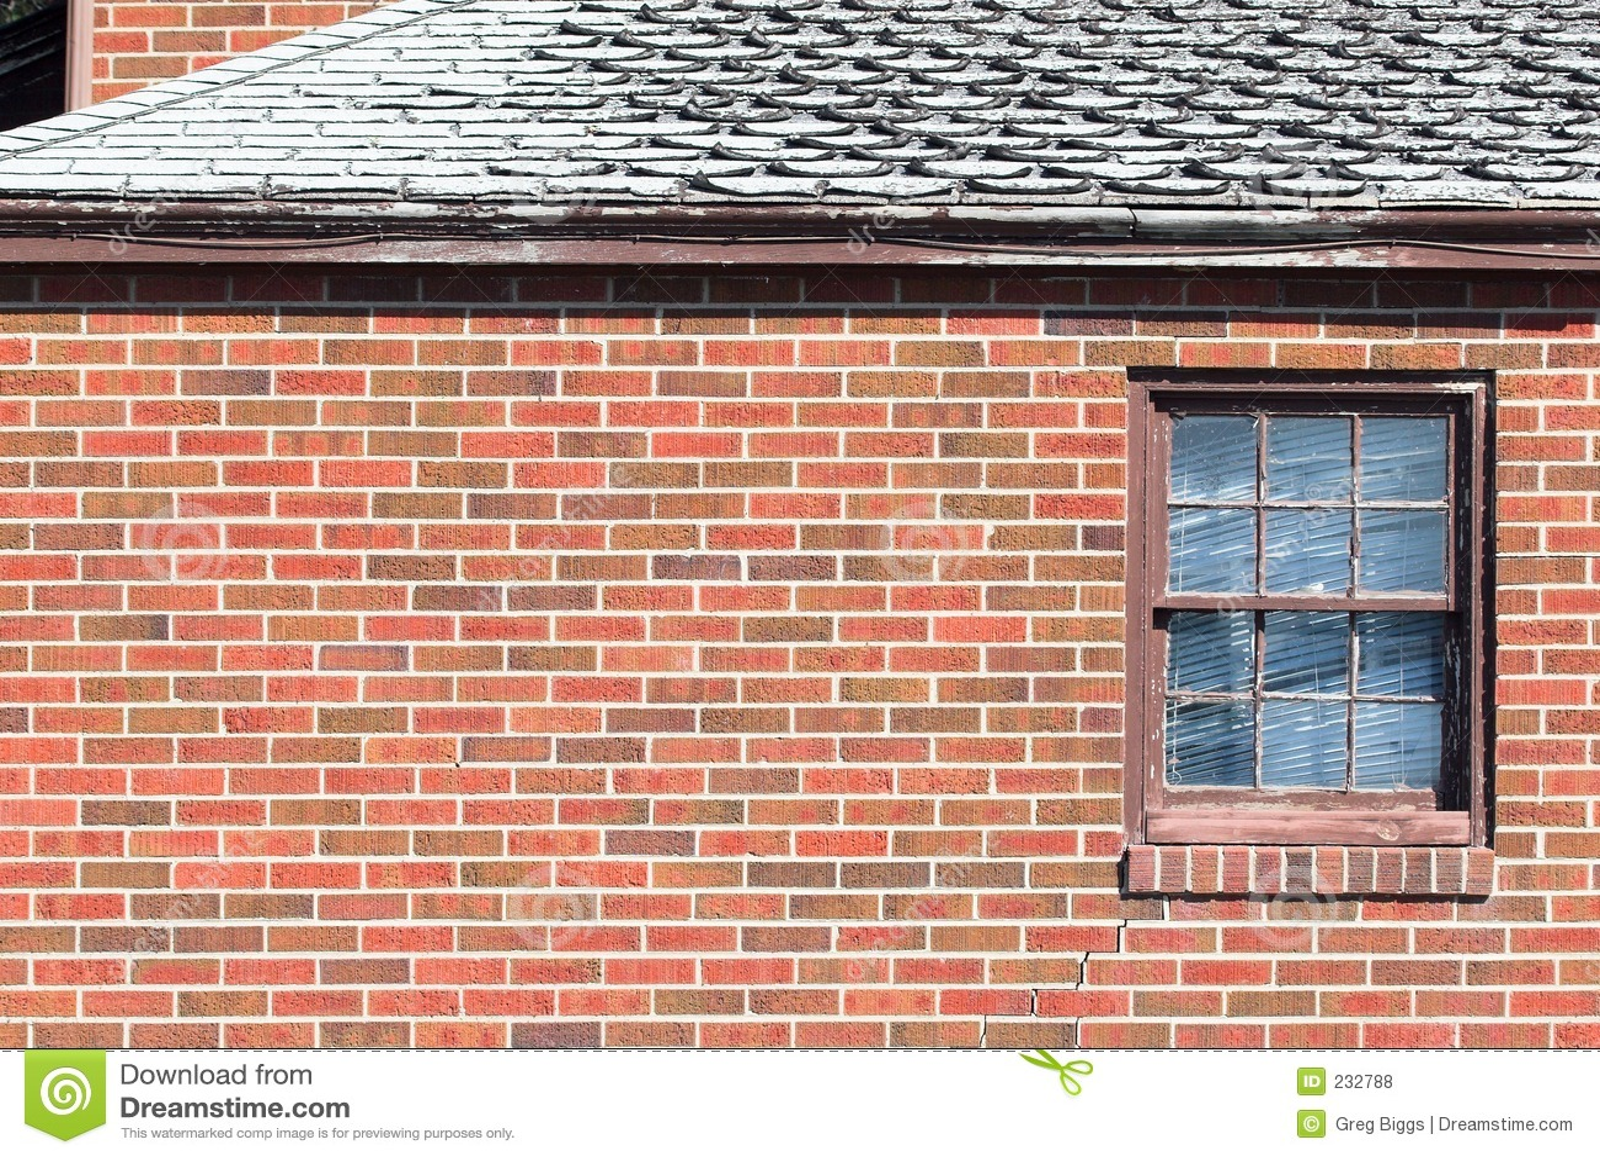 Brick Wall Window Royalty Free Stock Photos Image 232788